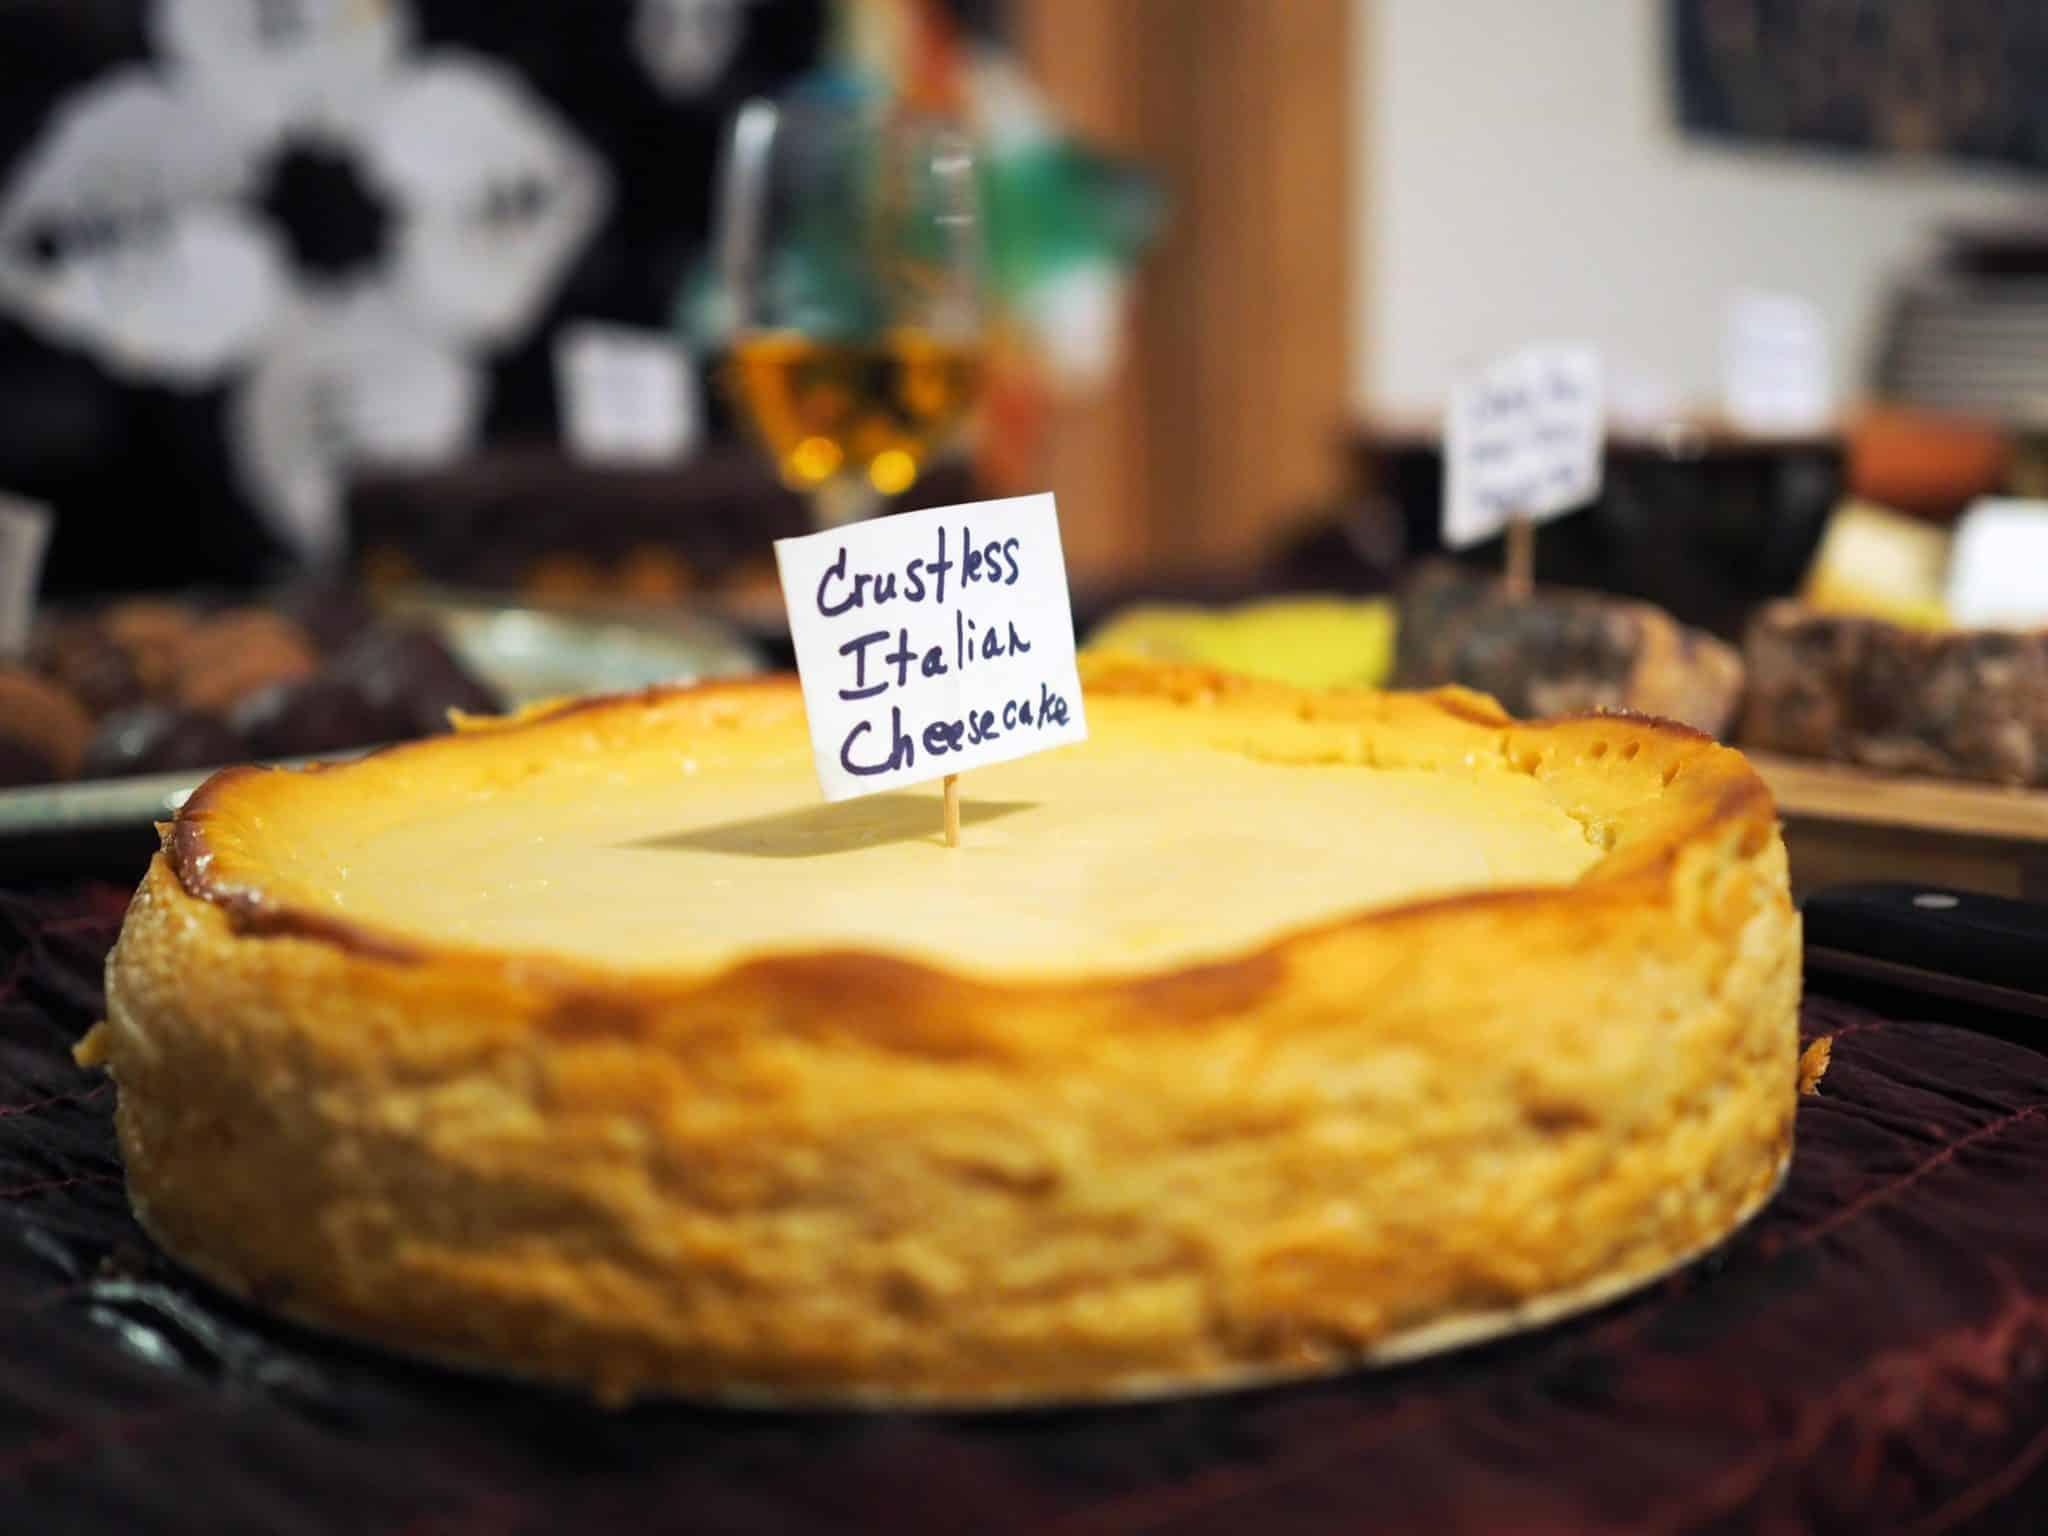 Crustless Italian Cheese Cake